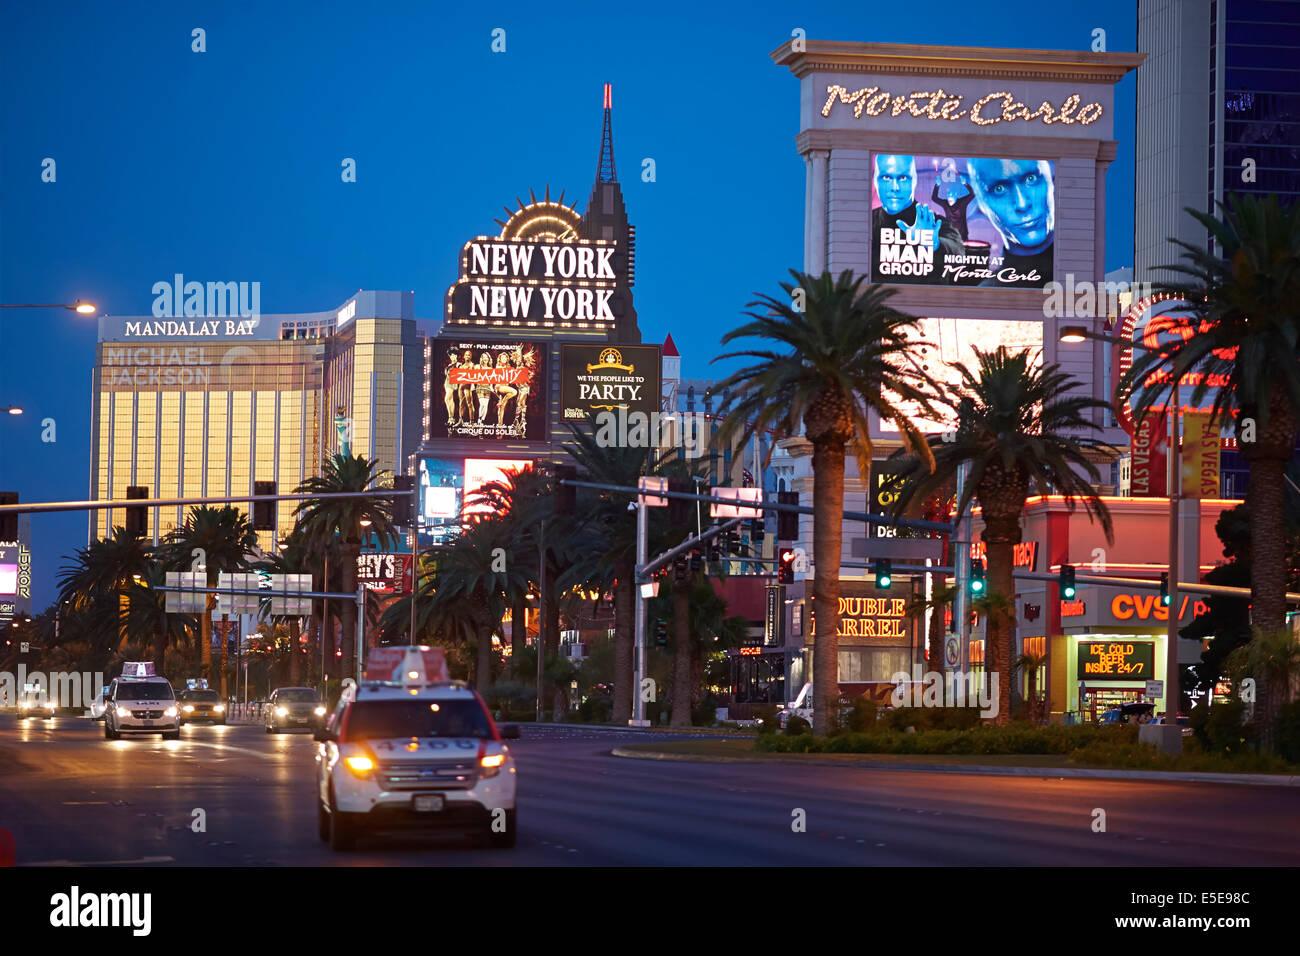 New York-New York Hotel & Casino located on the Las Vegas Strip at Las Vegas Boulevard South, in Paradise, Nevada. - Stock Image